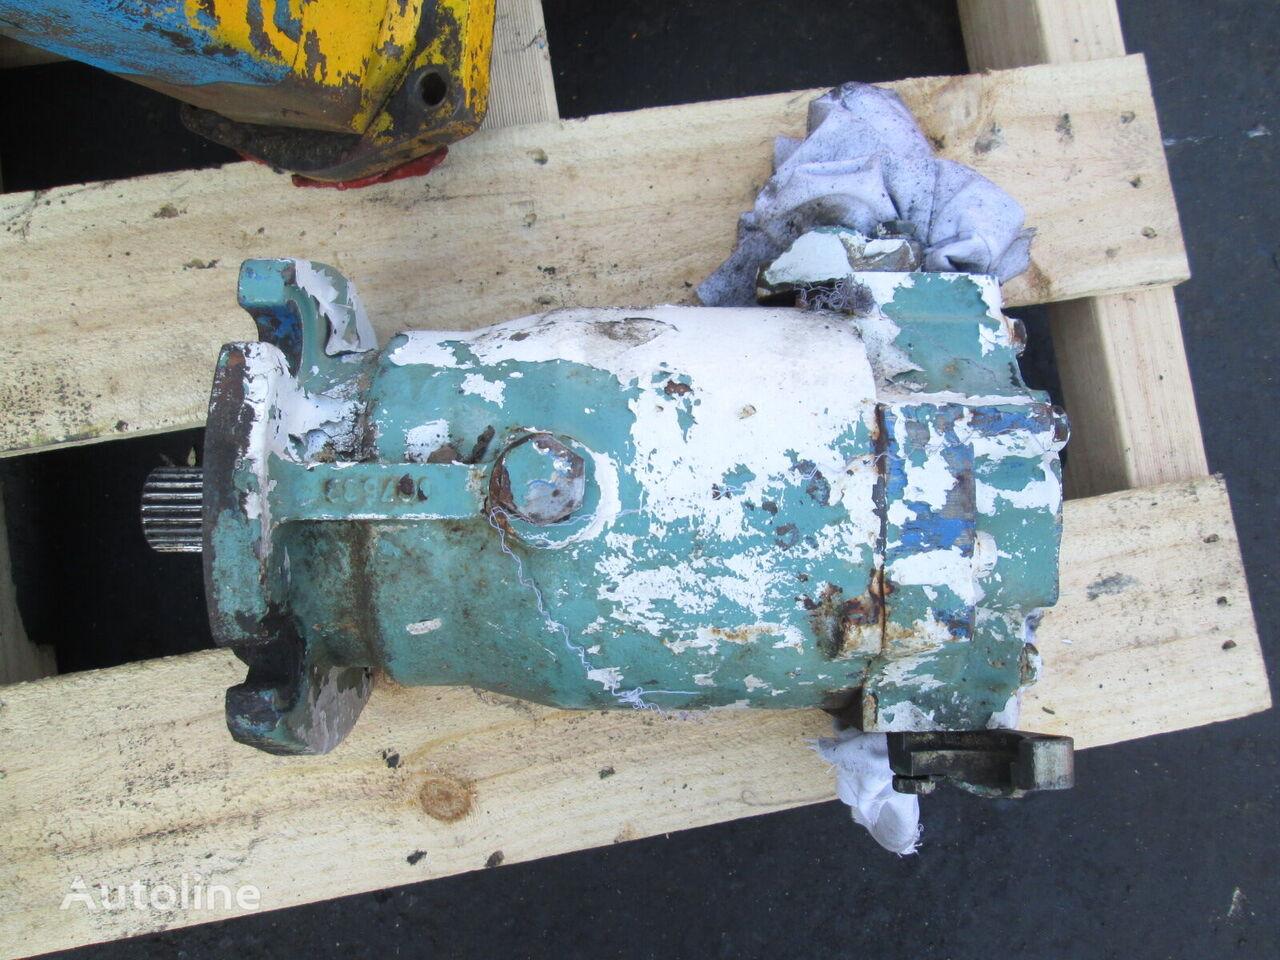 Sauer-Danfoss SMF22 hydraulic motor for wheel loader